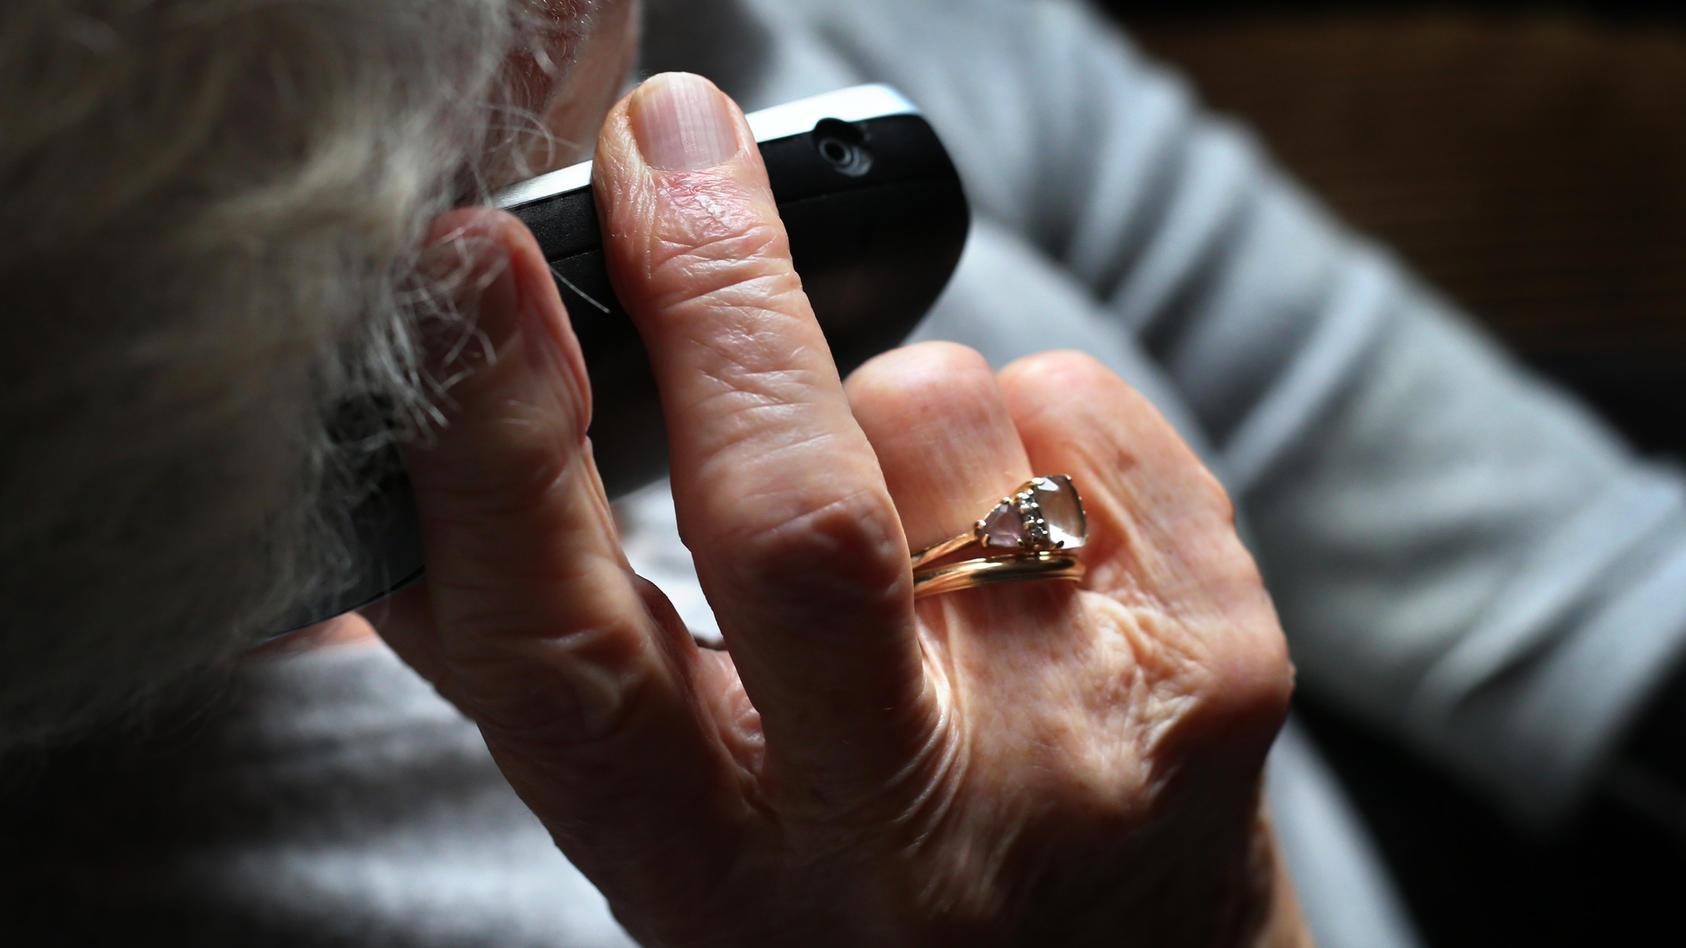 Enkeltrick: 10 000 Euro von Seniorin in Ettlingen ergaunert